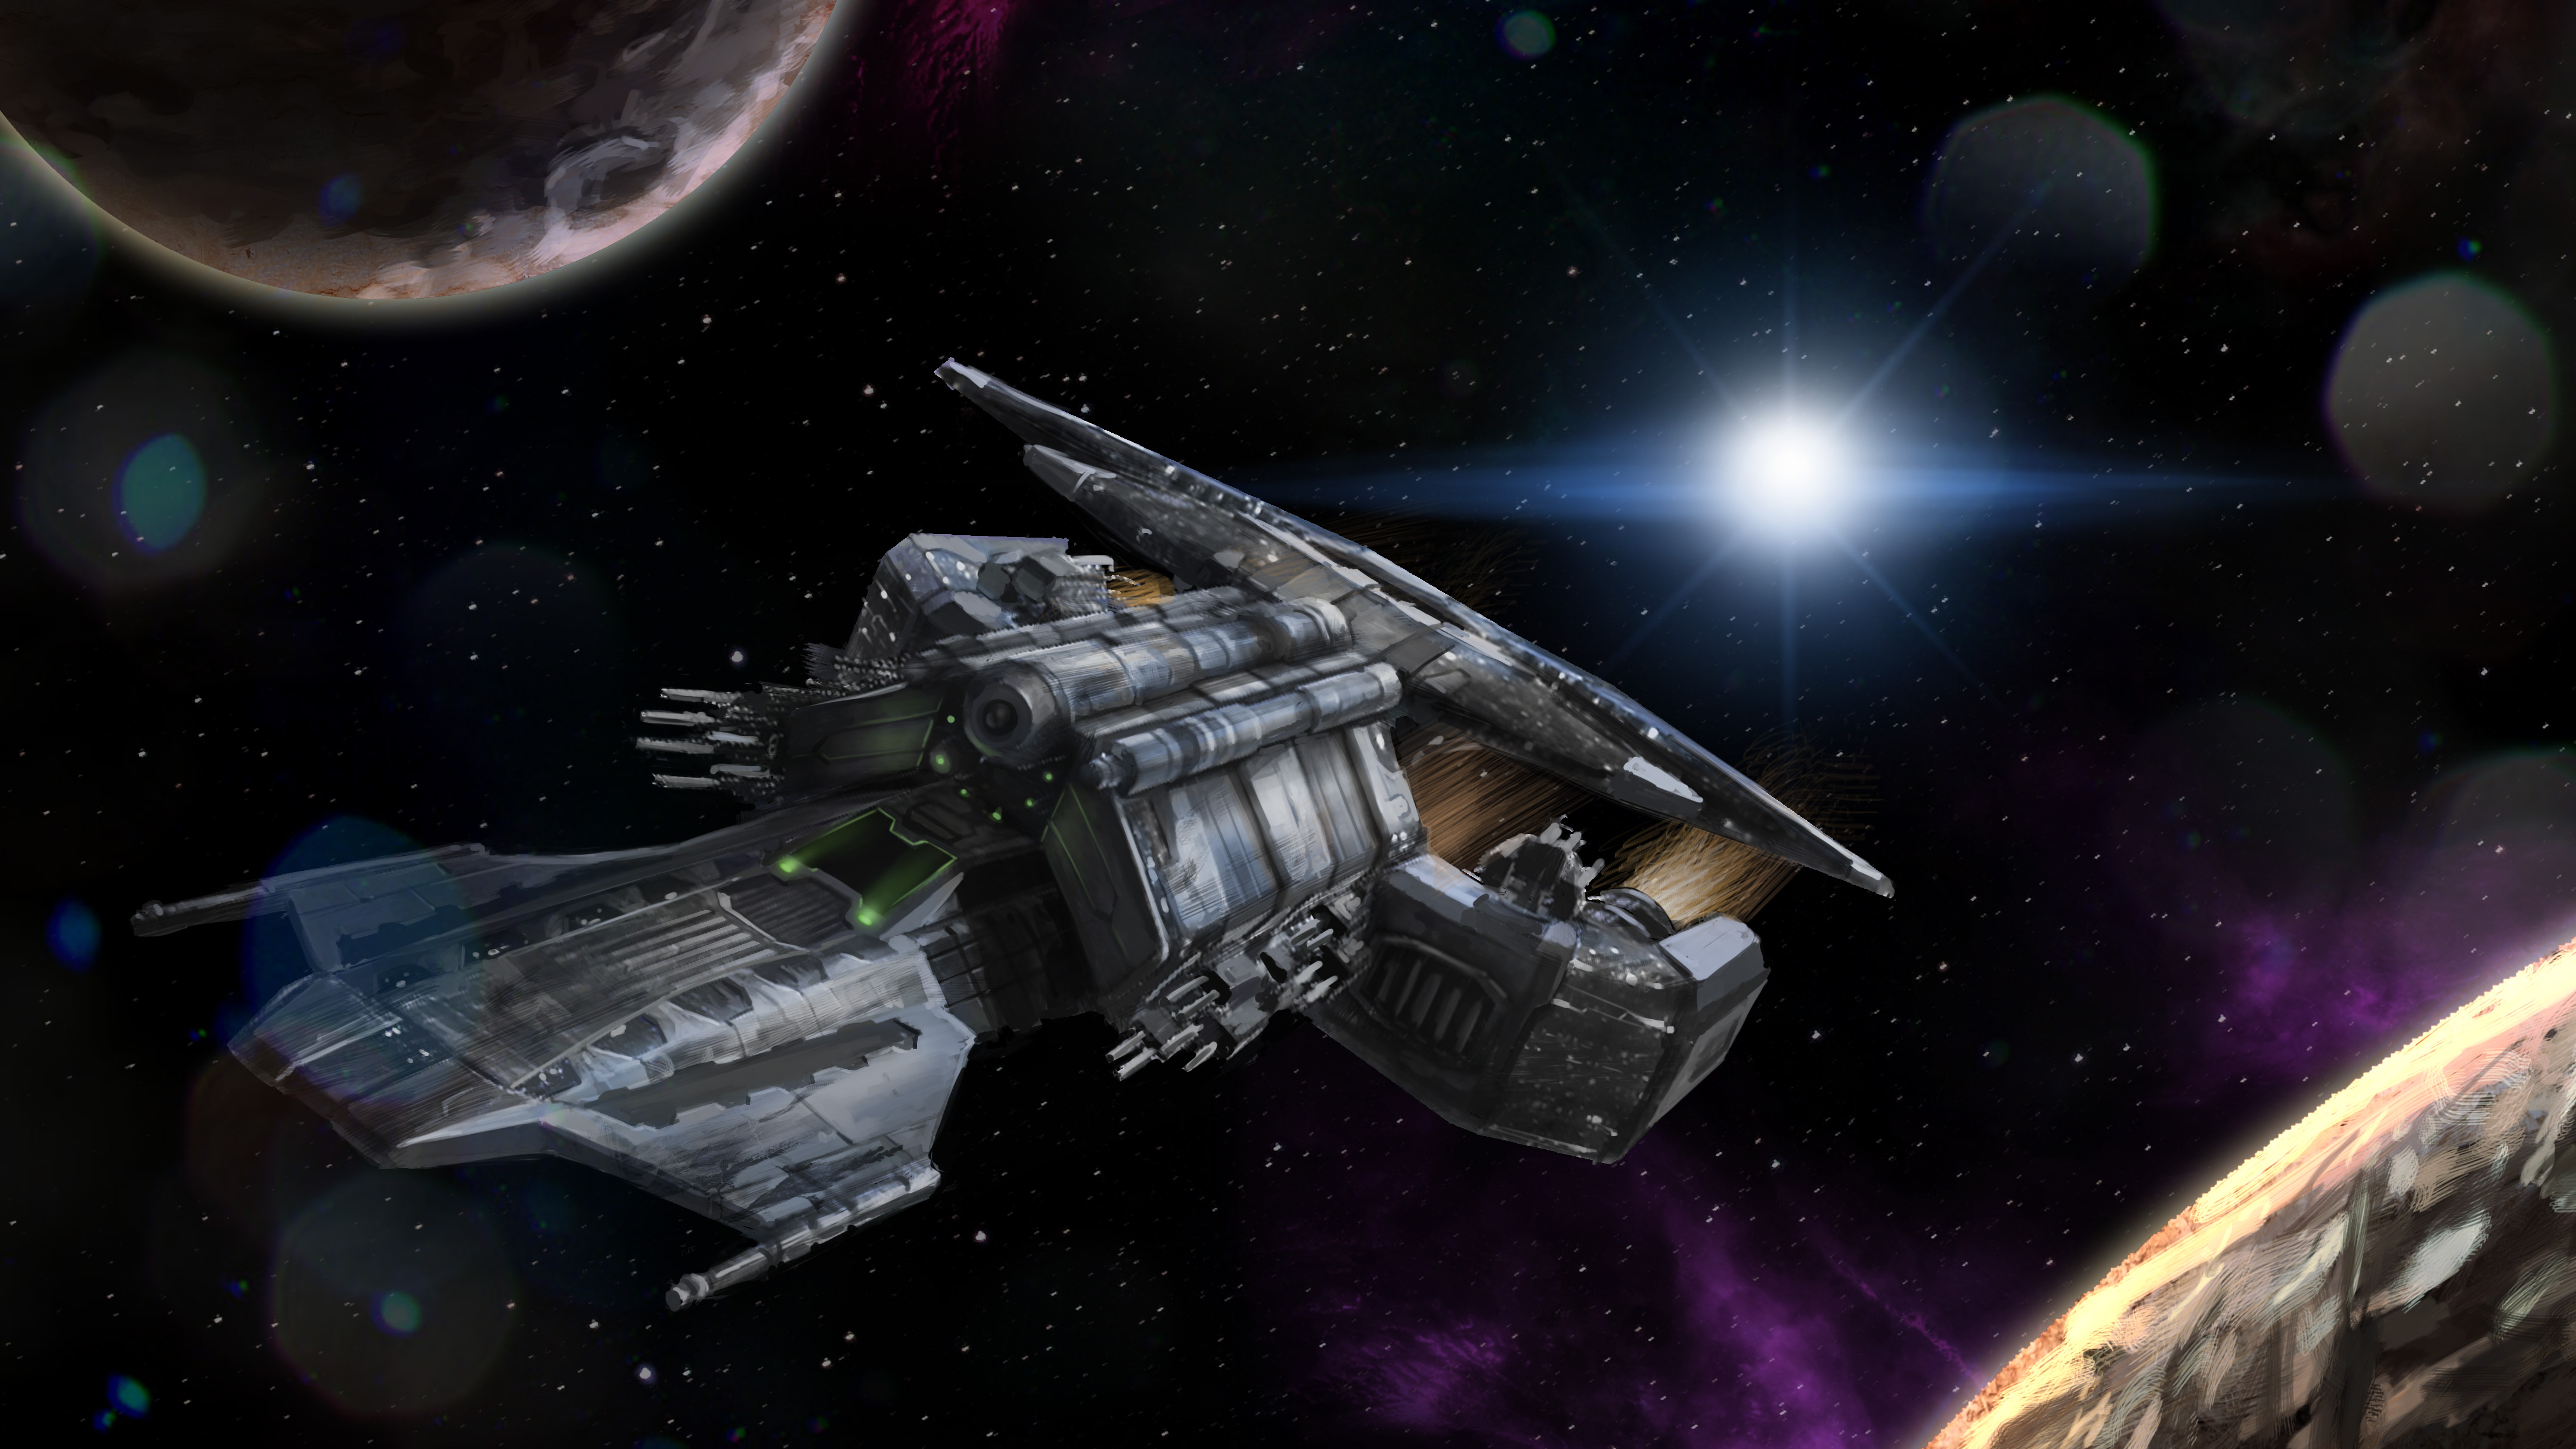 3d space adventures fucks pictures